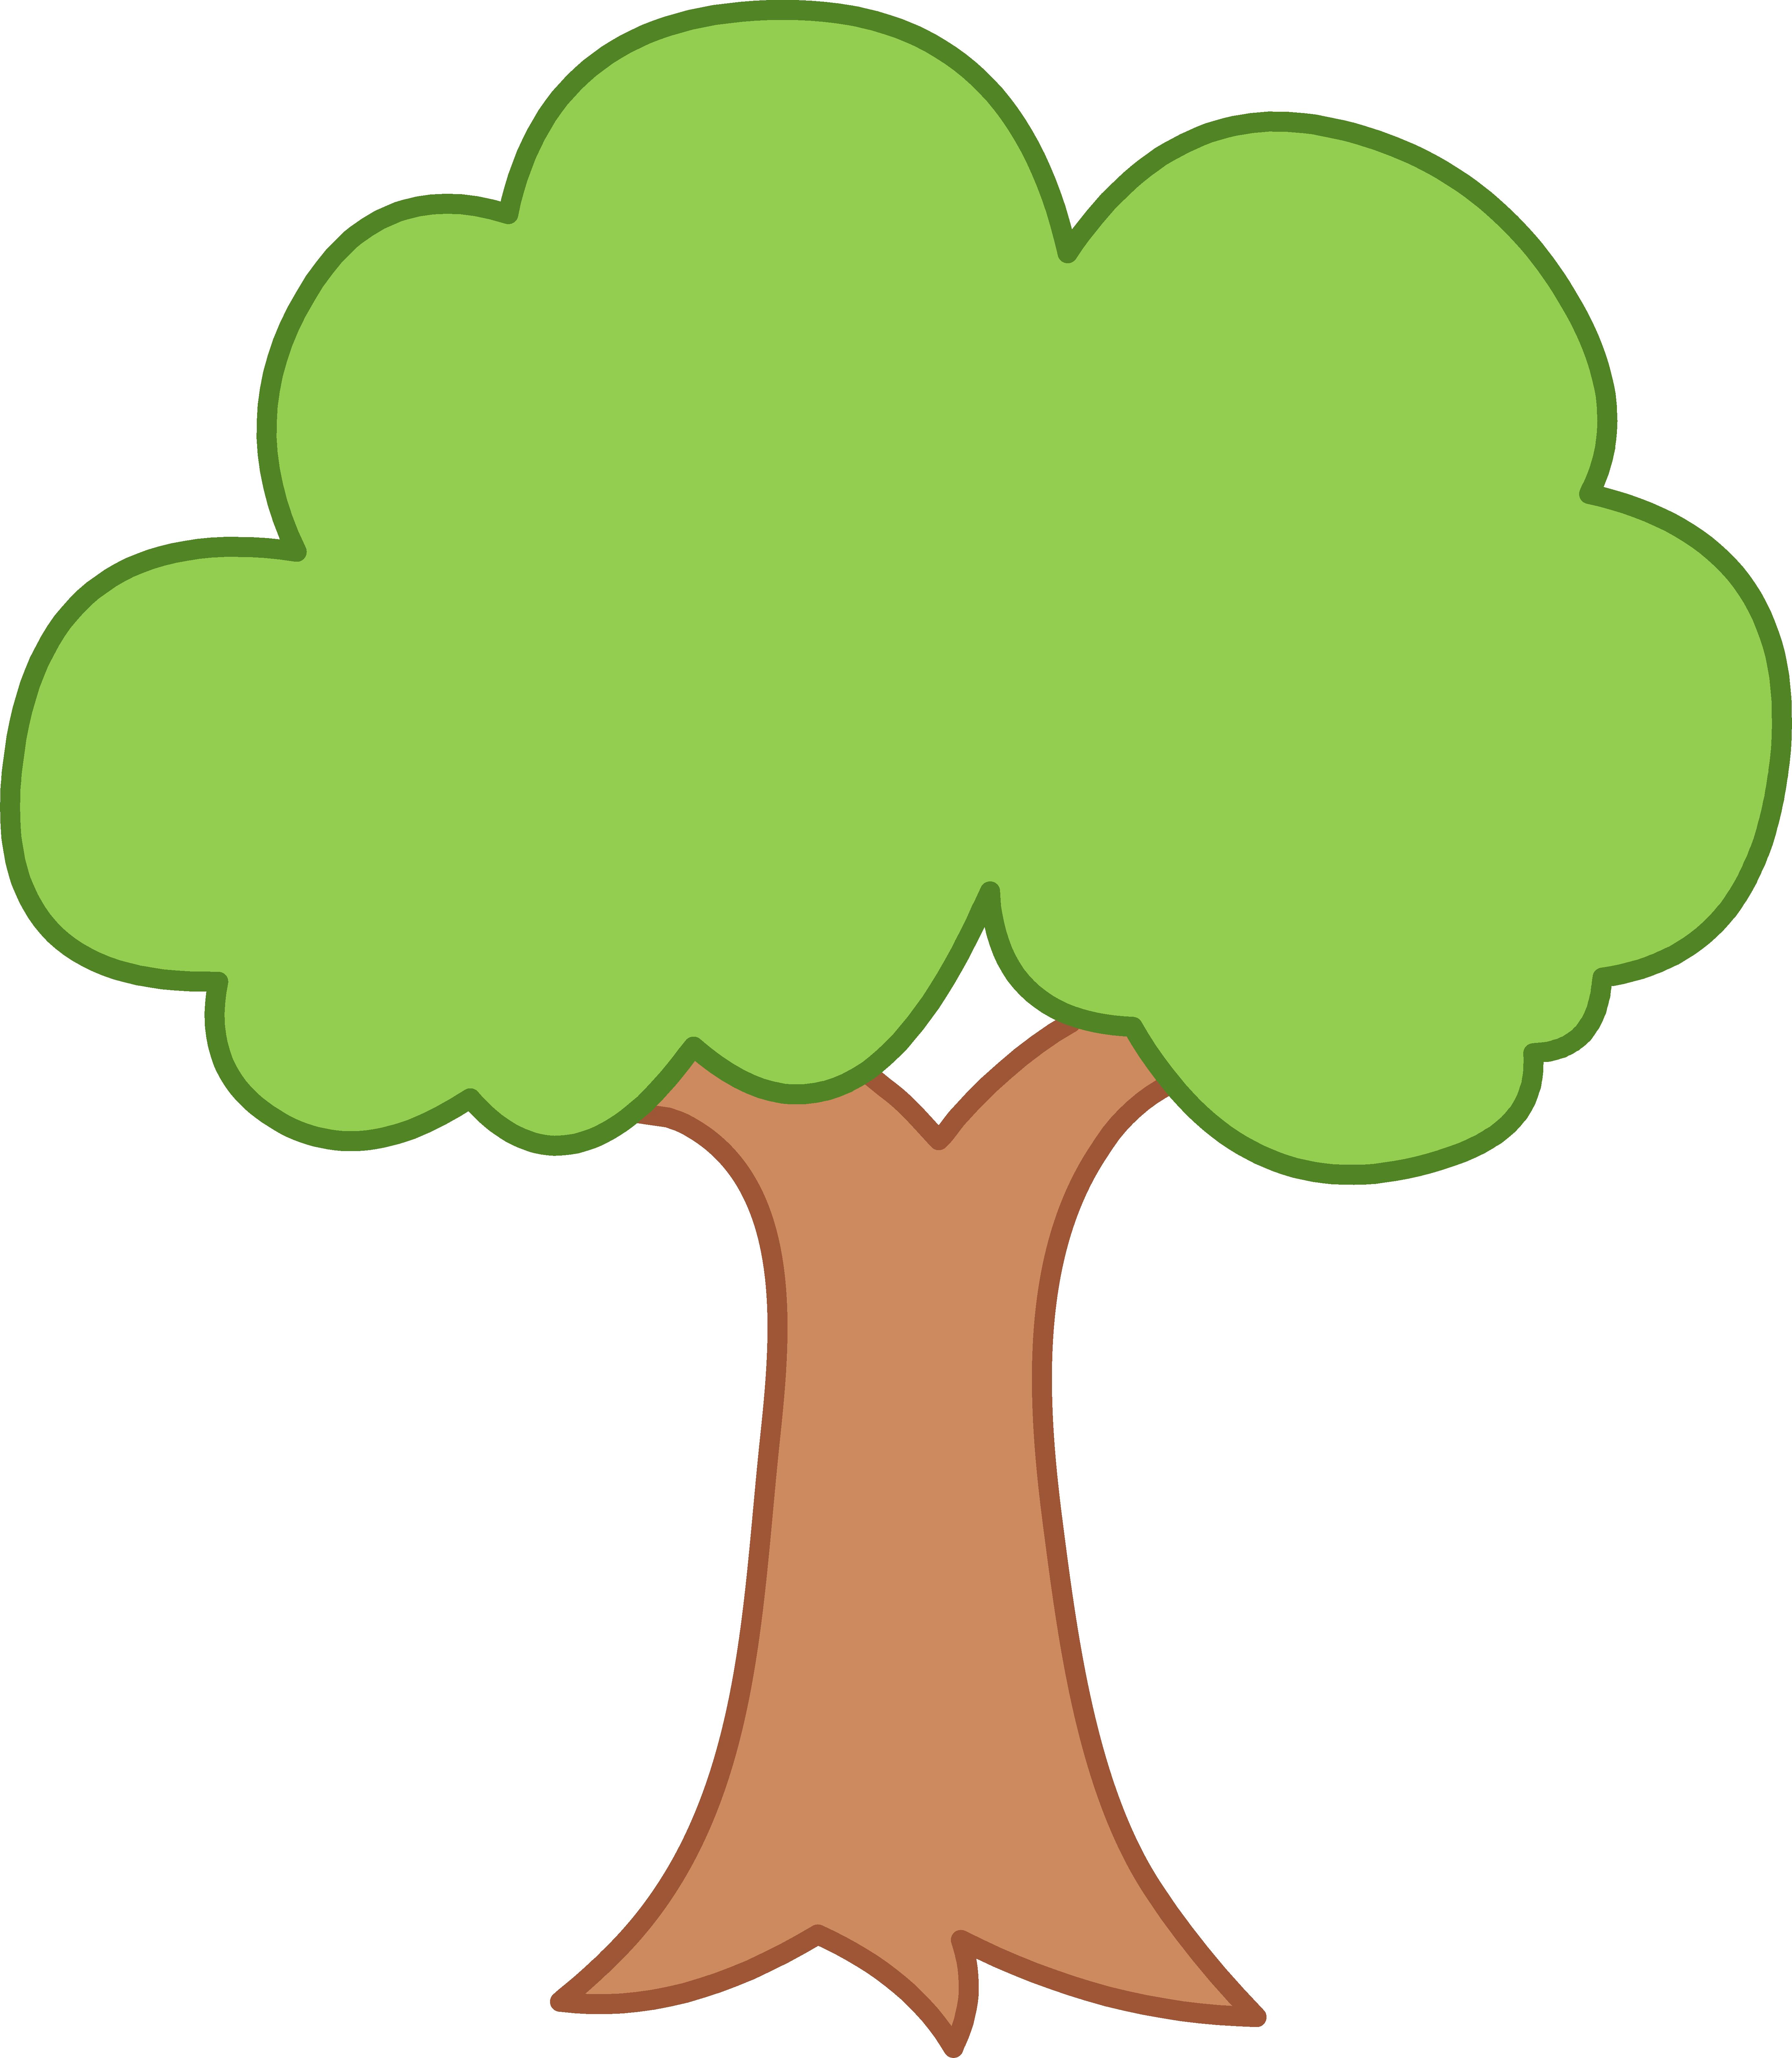 Green Tree Clipart. Clipart Panda - Free